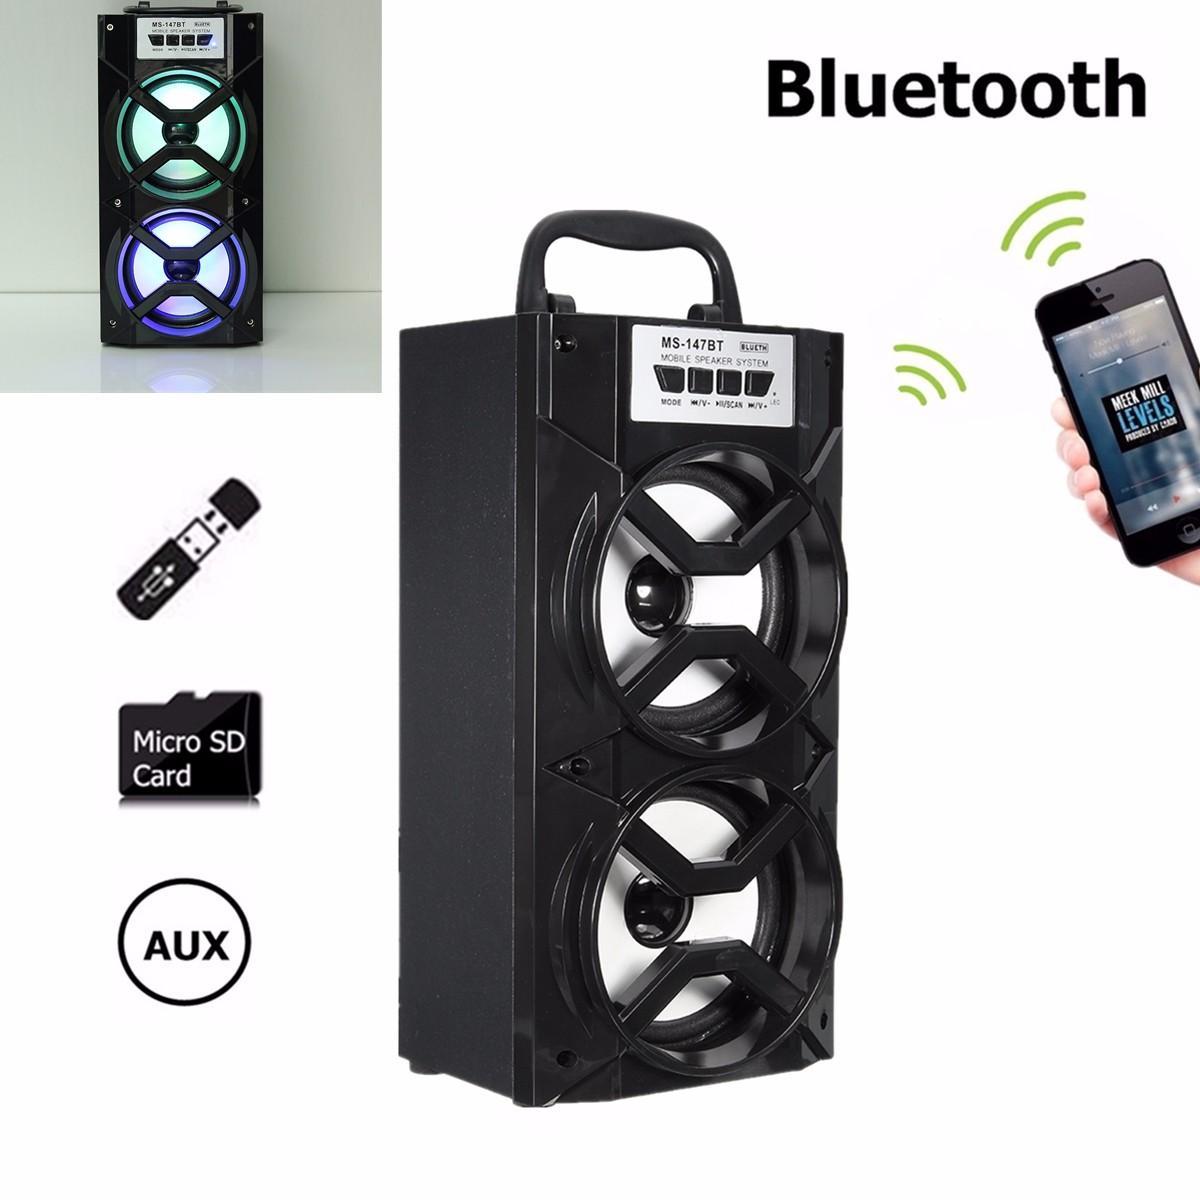 MS-147BT Portable Outdoor bluetooth Wireless Super Bass Speaker USB TF AUX  FM Radio